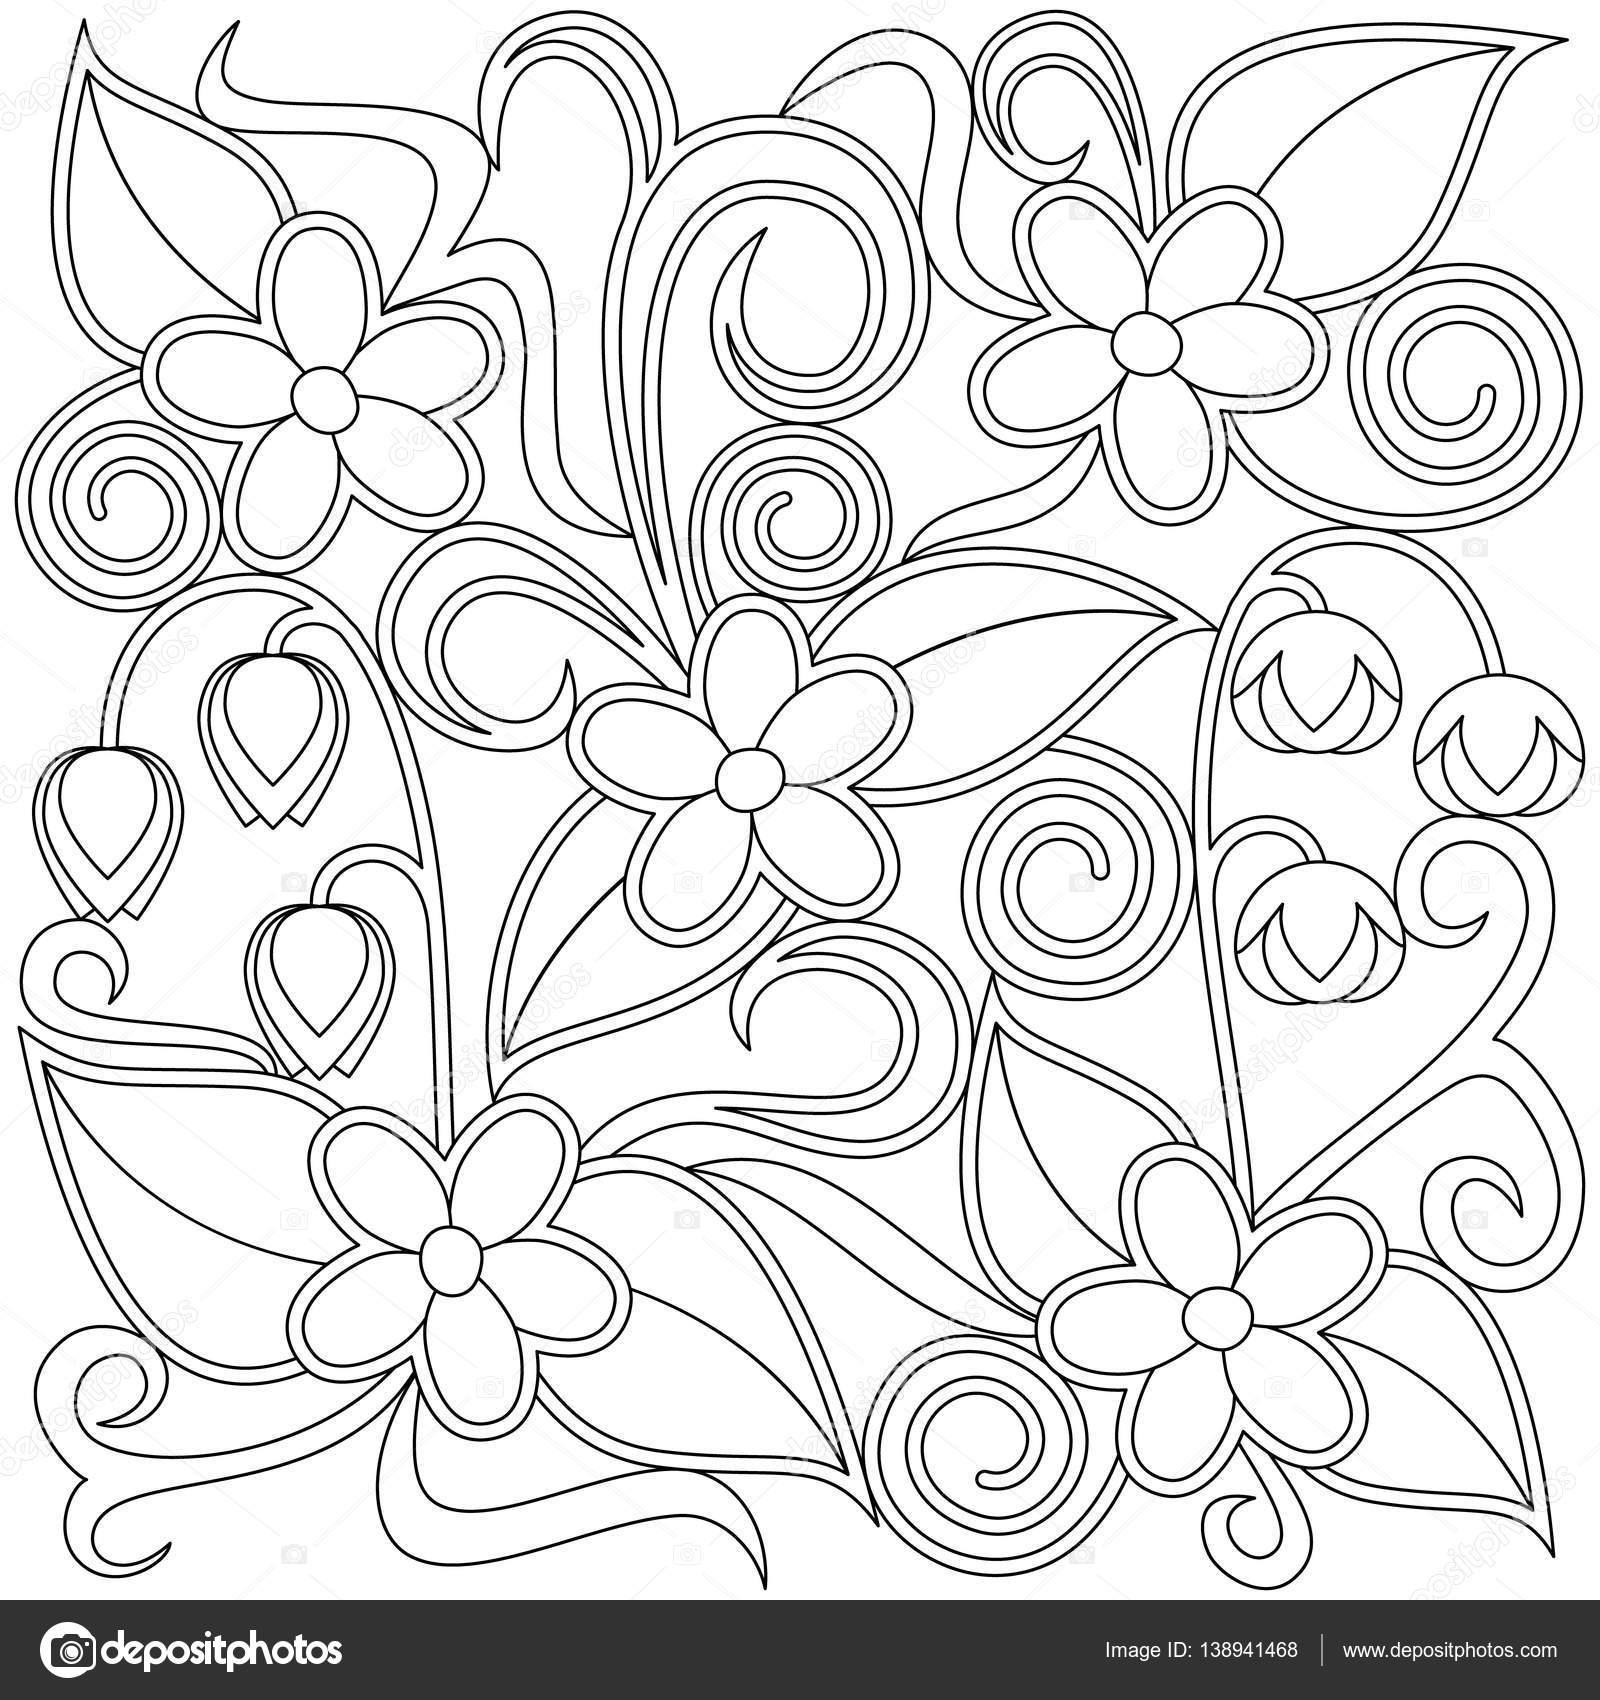 Floral Kleurplaat Stockvector Vectoramac 138941468